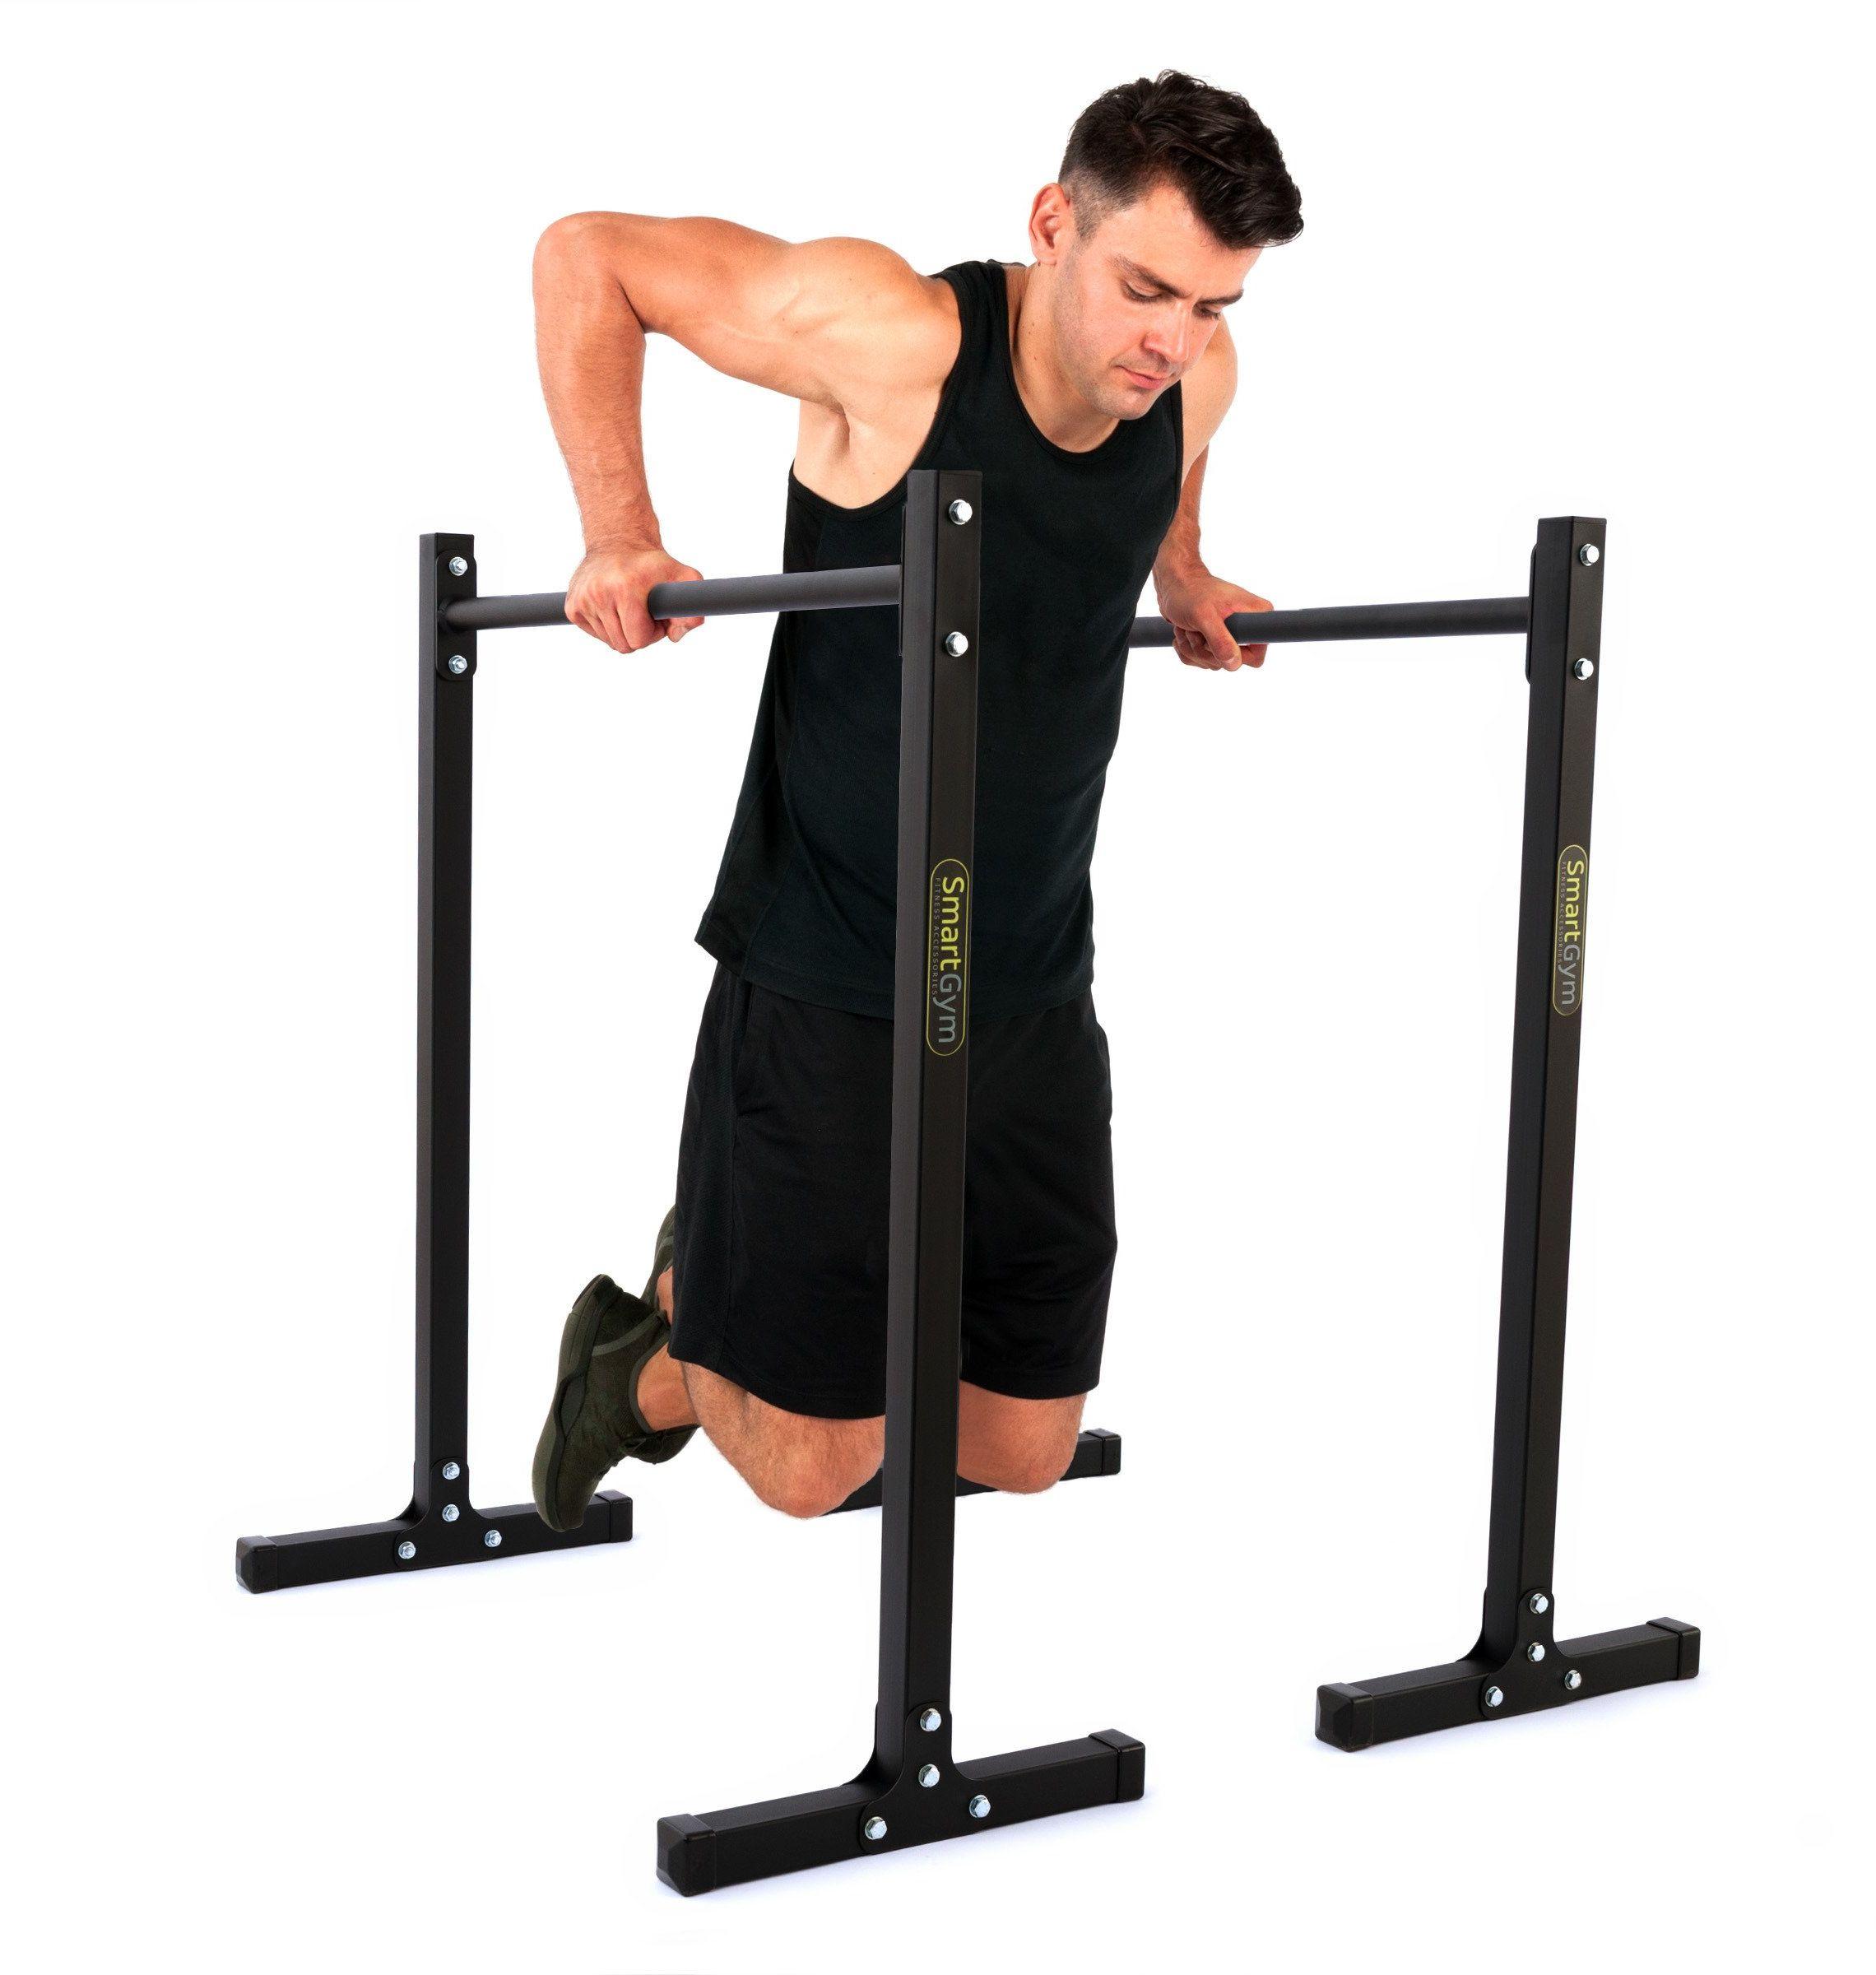 Poręcze do pompek SG-14 - SmartGym Fitness Accessories